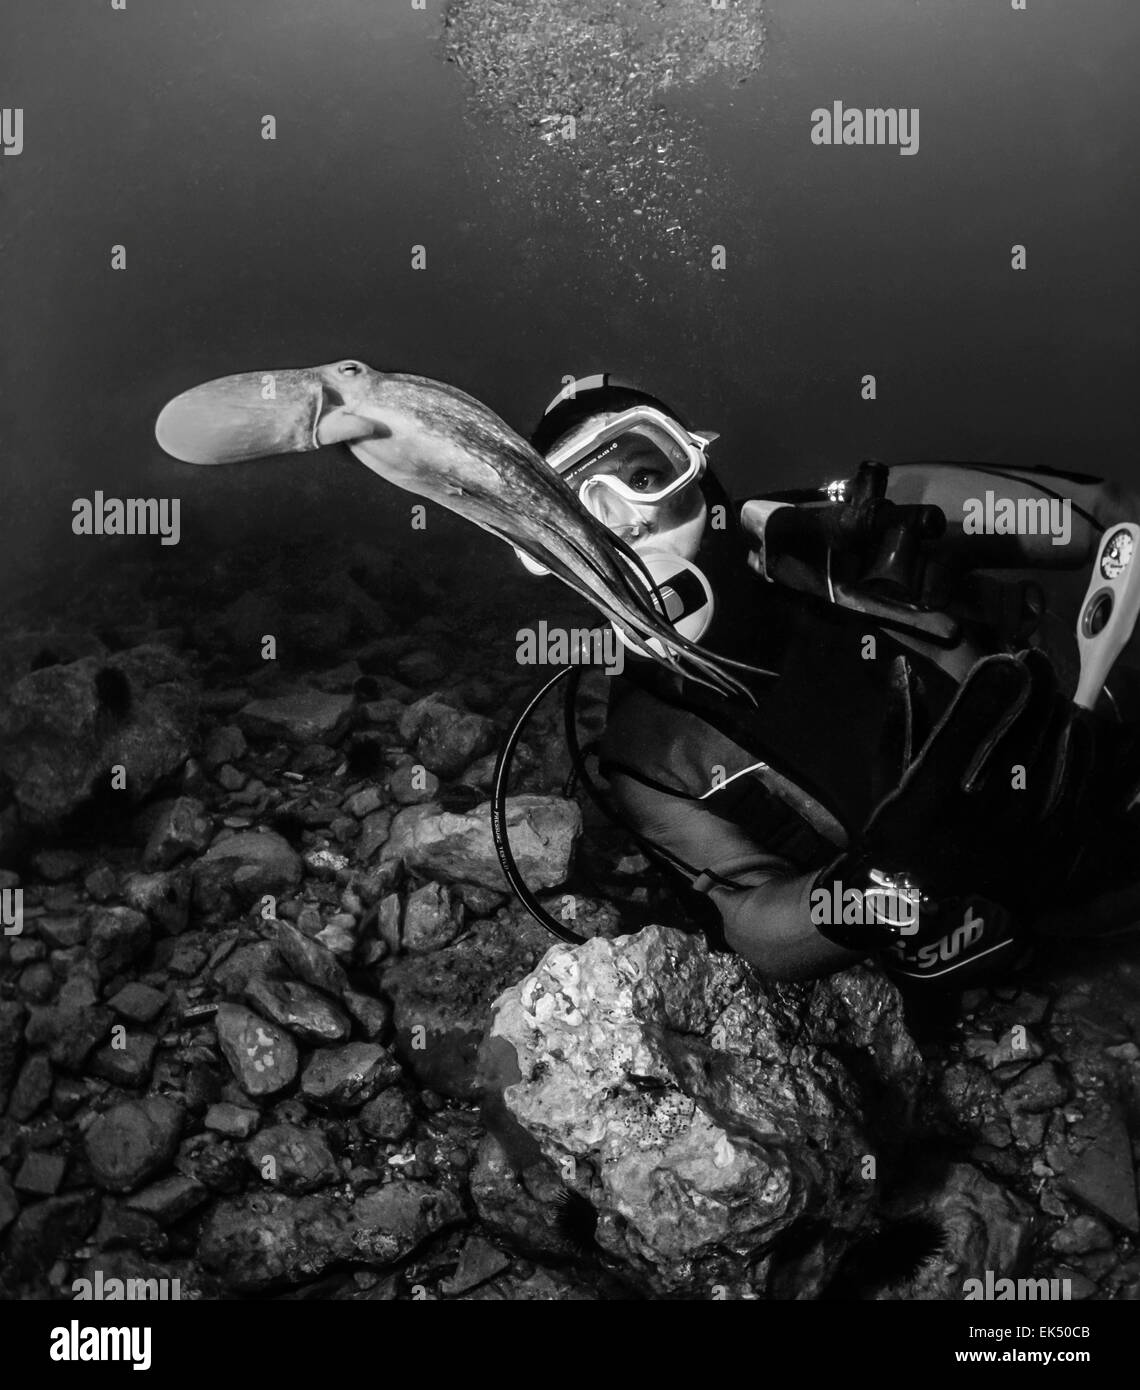 Montenegro, Adriatic Sea, U.W. photo, small octopus and diver - FILM SCAN - Stock Image